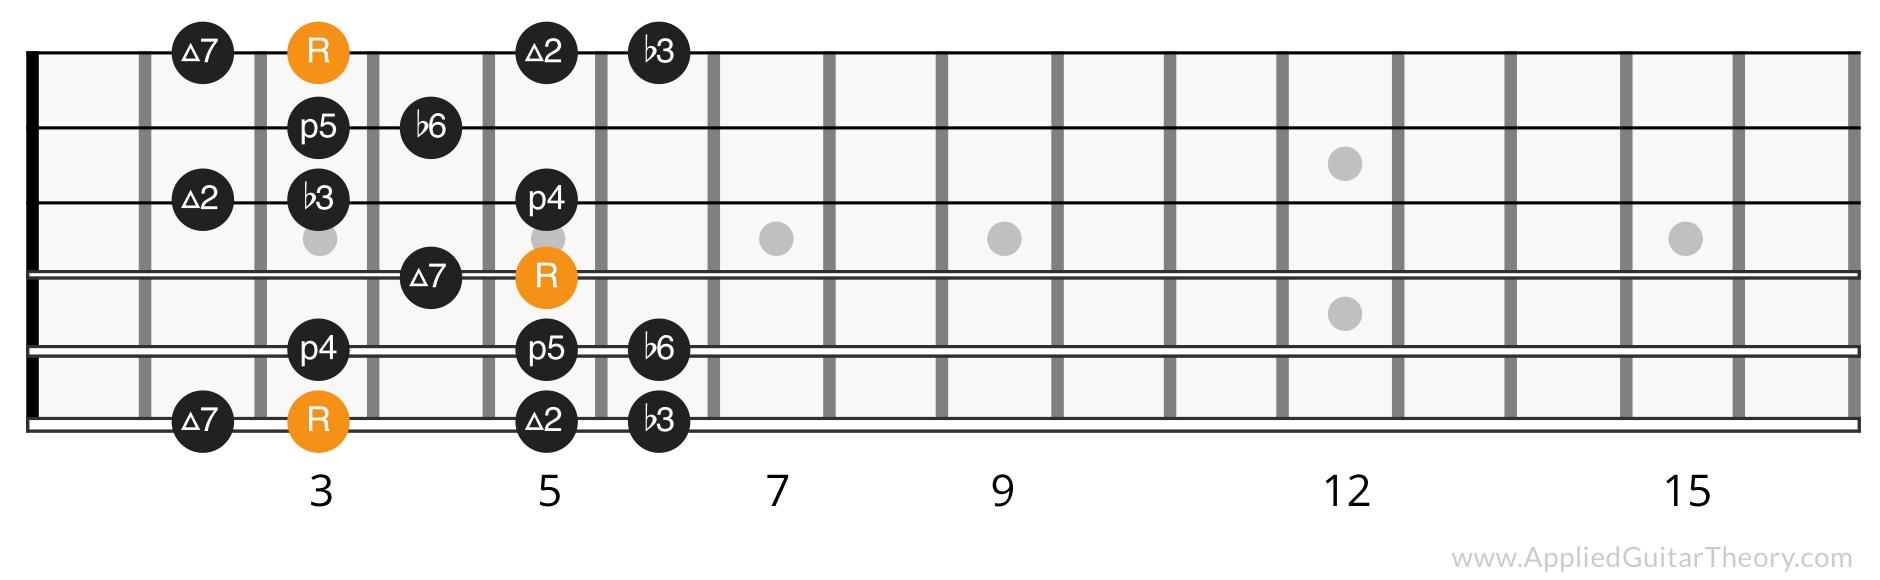 Harmonic minor position 1